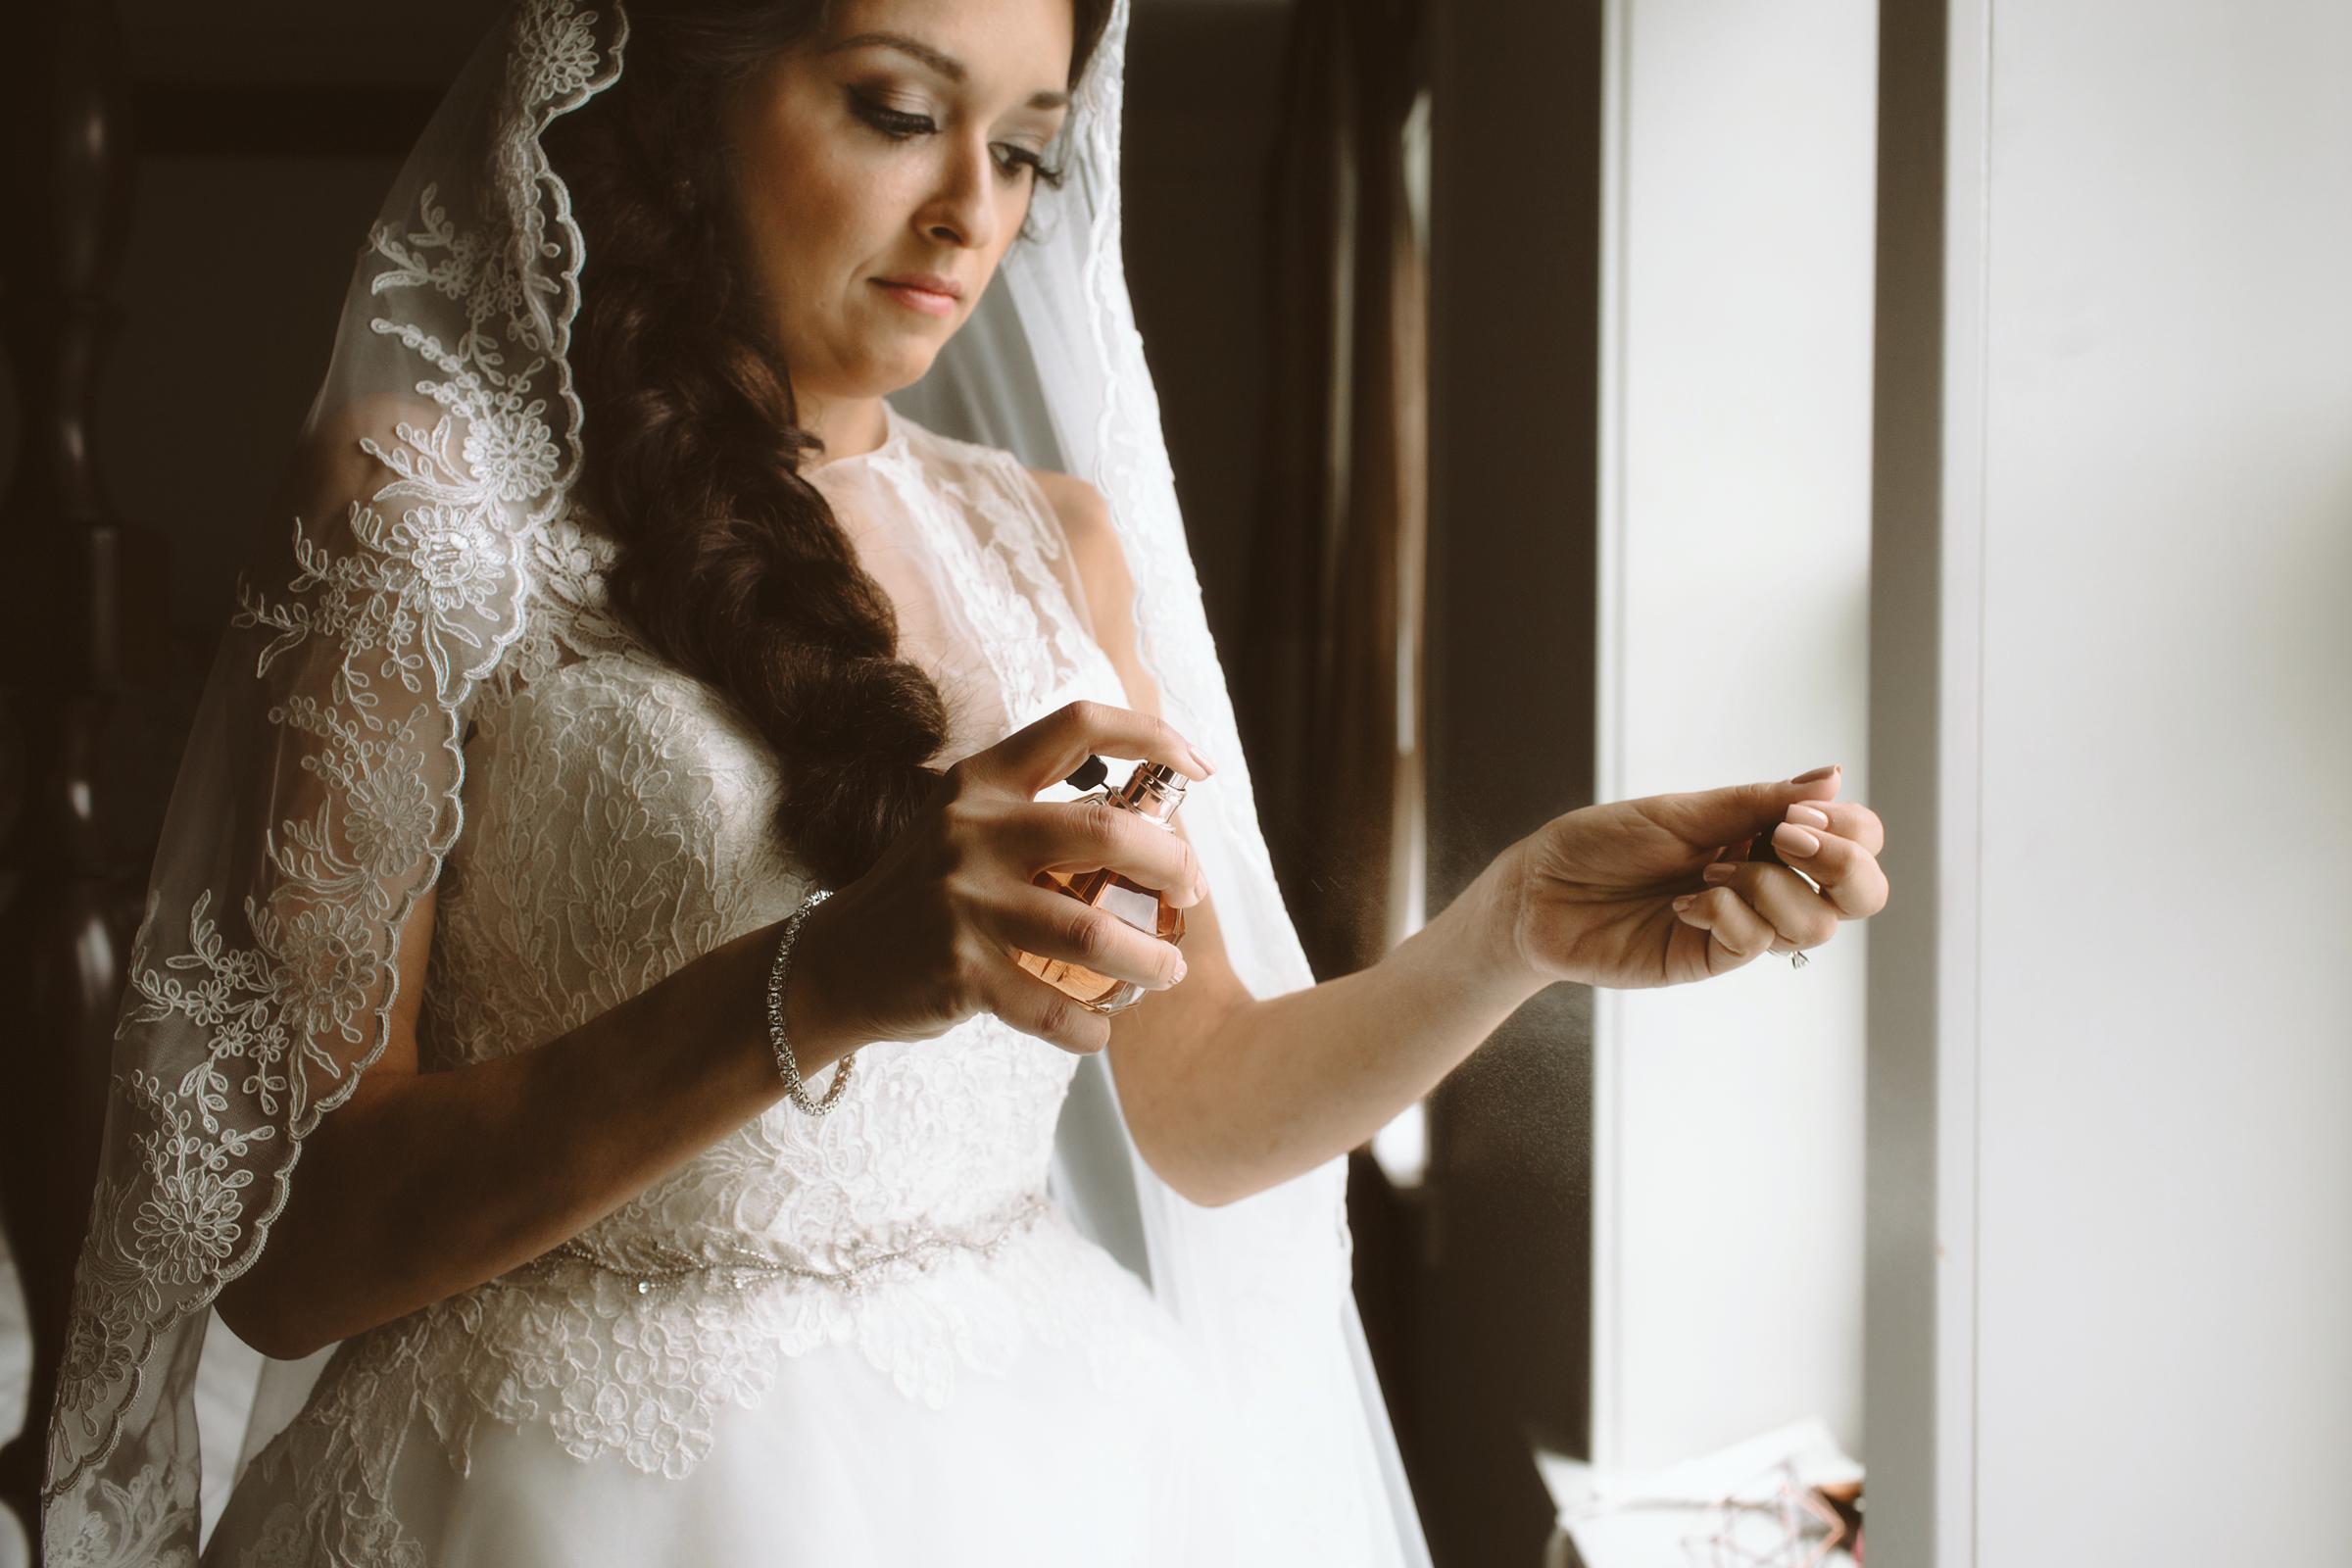 wedding day | MFA St Pete | Vanessa Boy Photography | vanessaboy.com-98.com |final.jpg